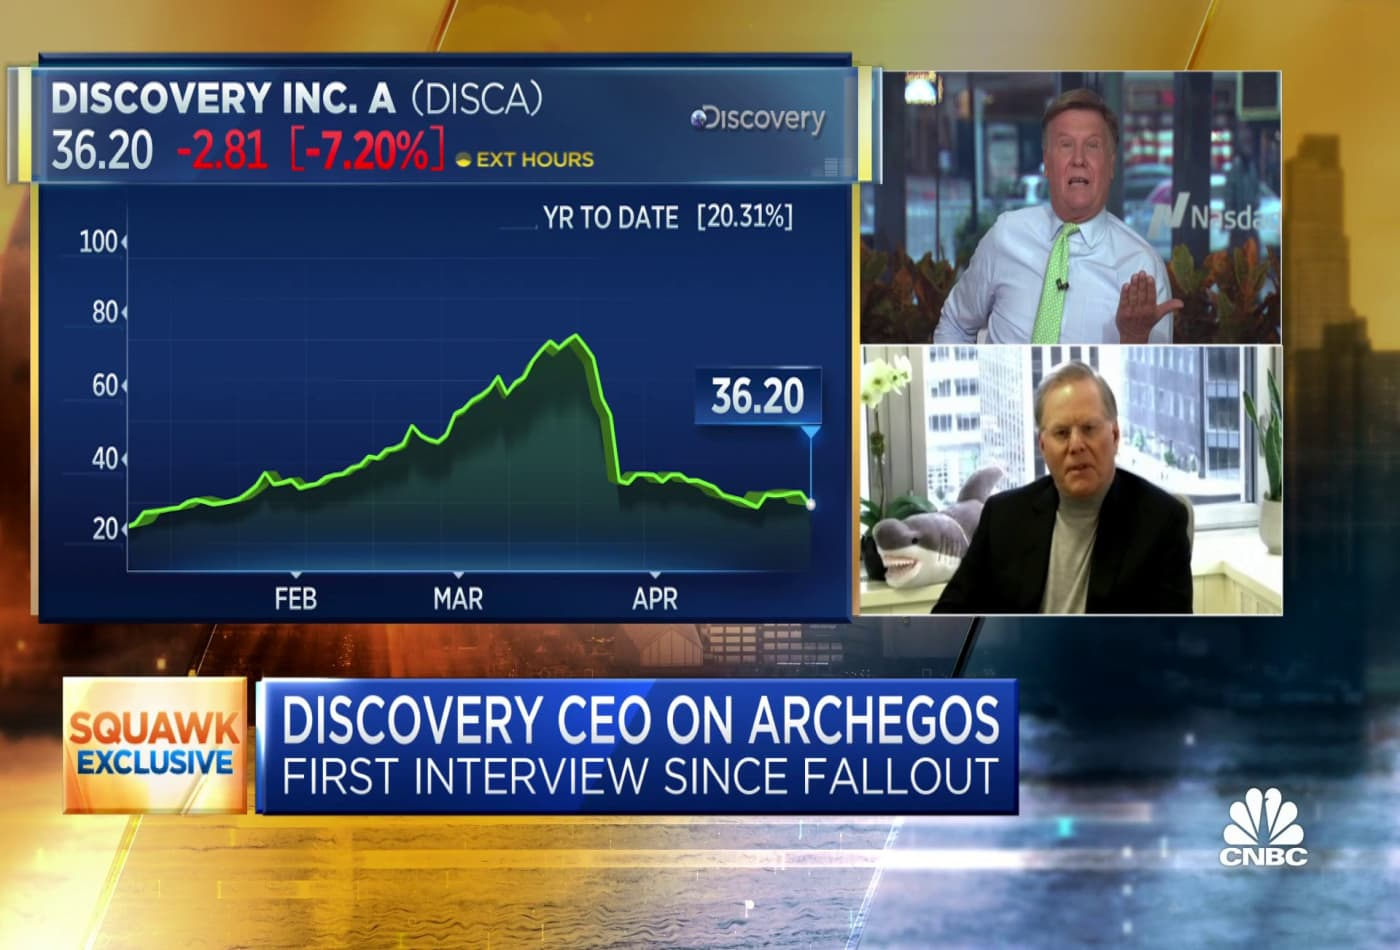 Discovery CEO David Zaslav on Archegos fallout hitting the stock